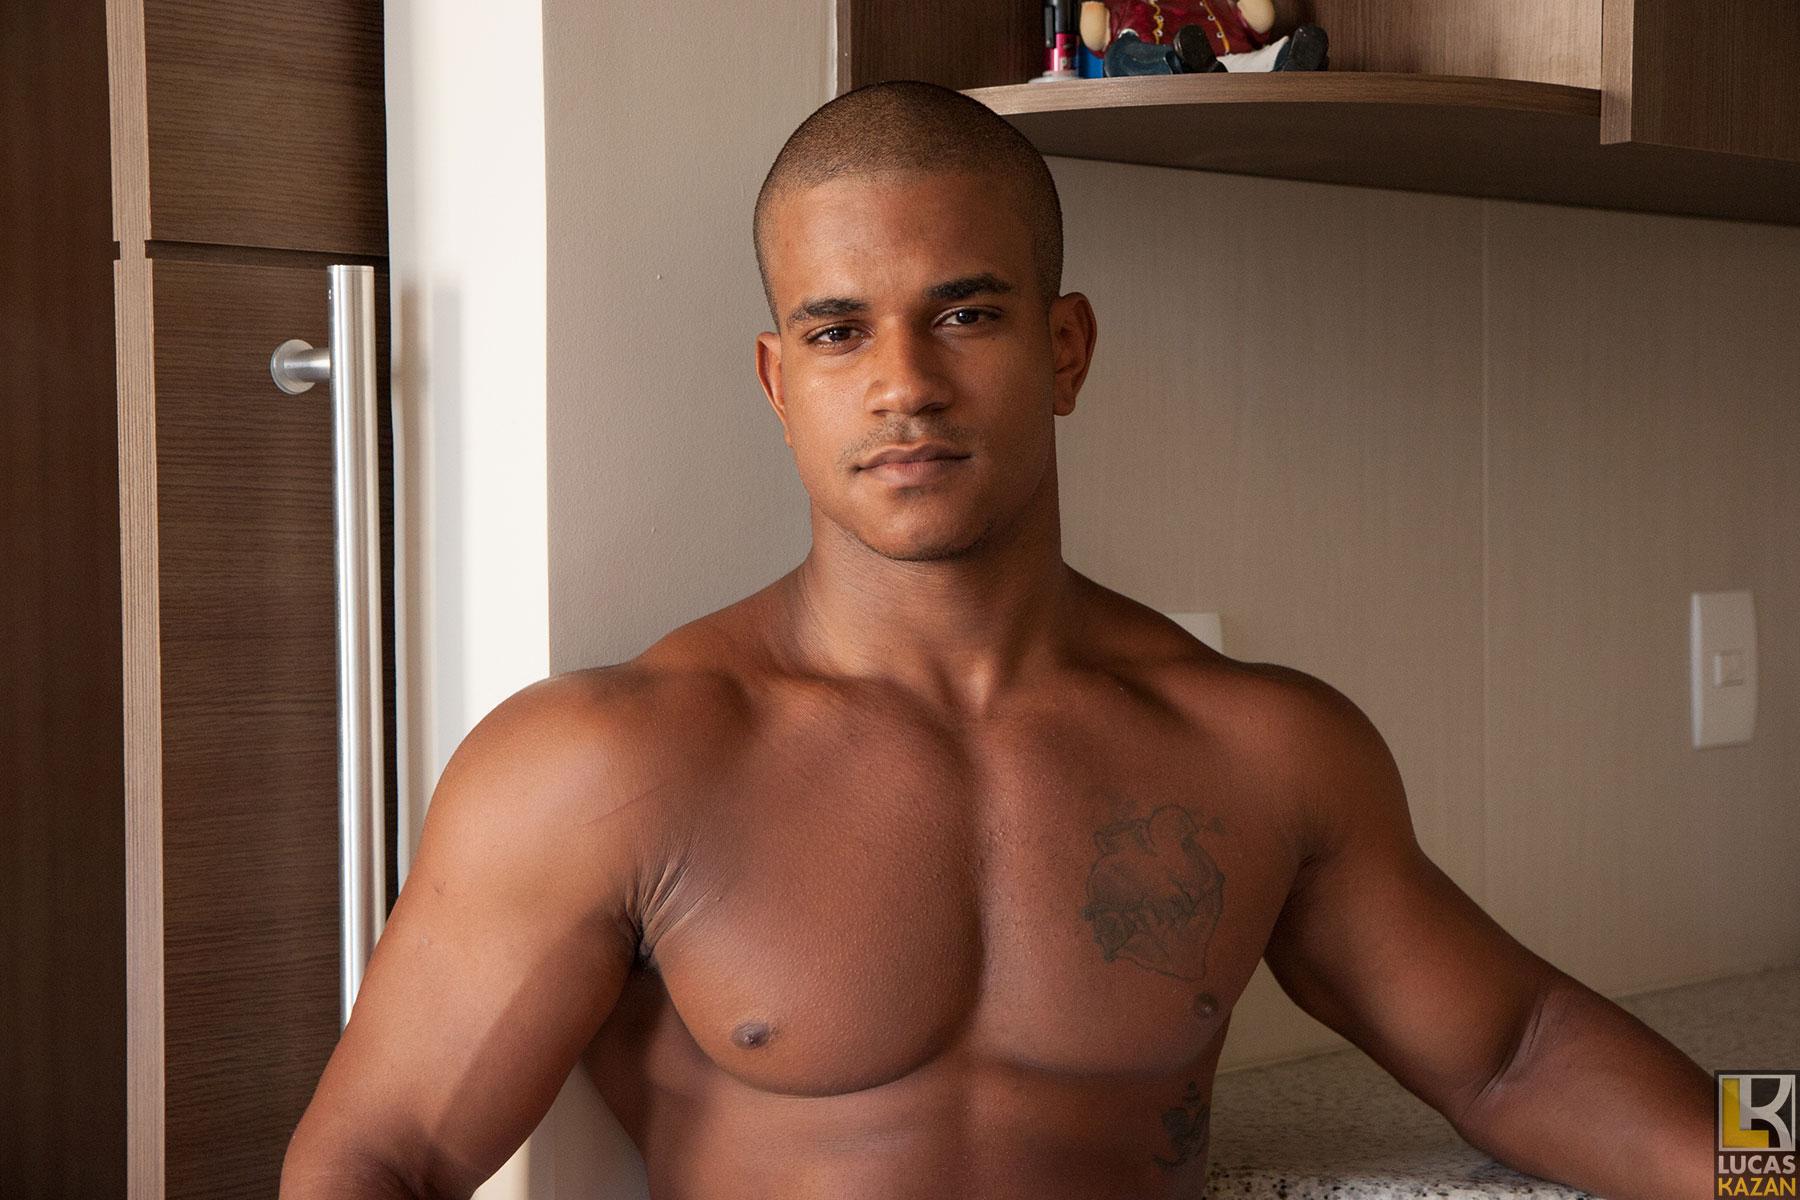 Carlos Porn brazilian bodybuilder carlos from lucaskazan